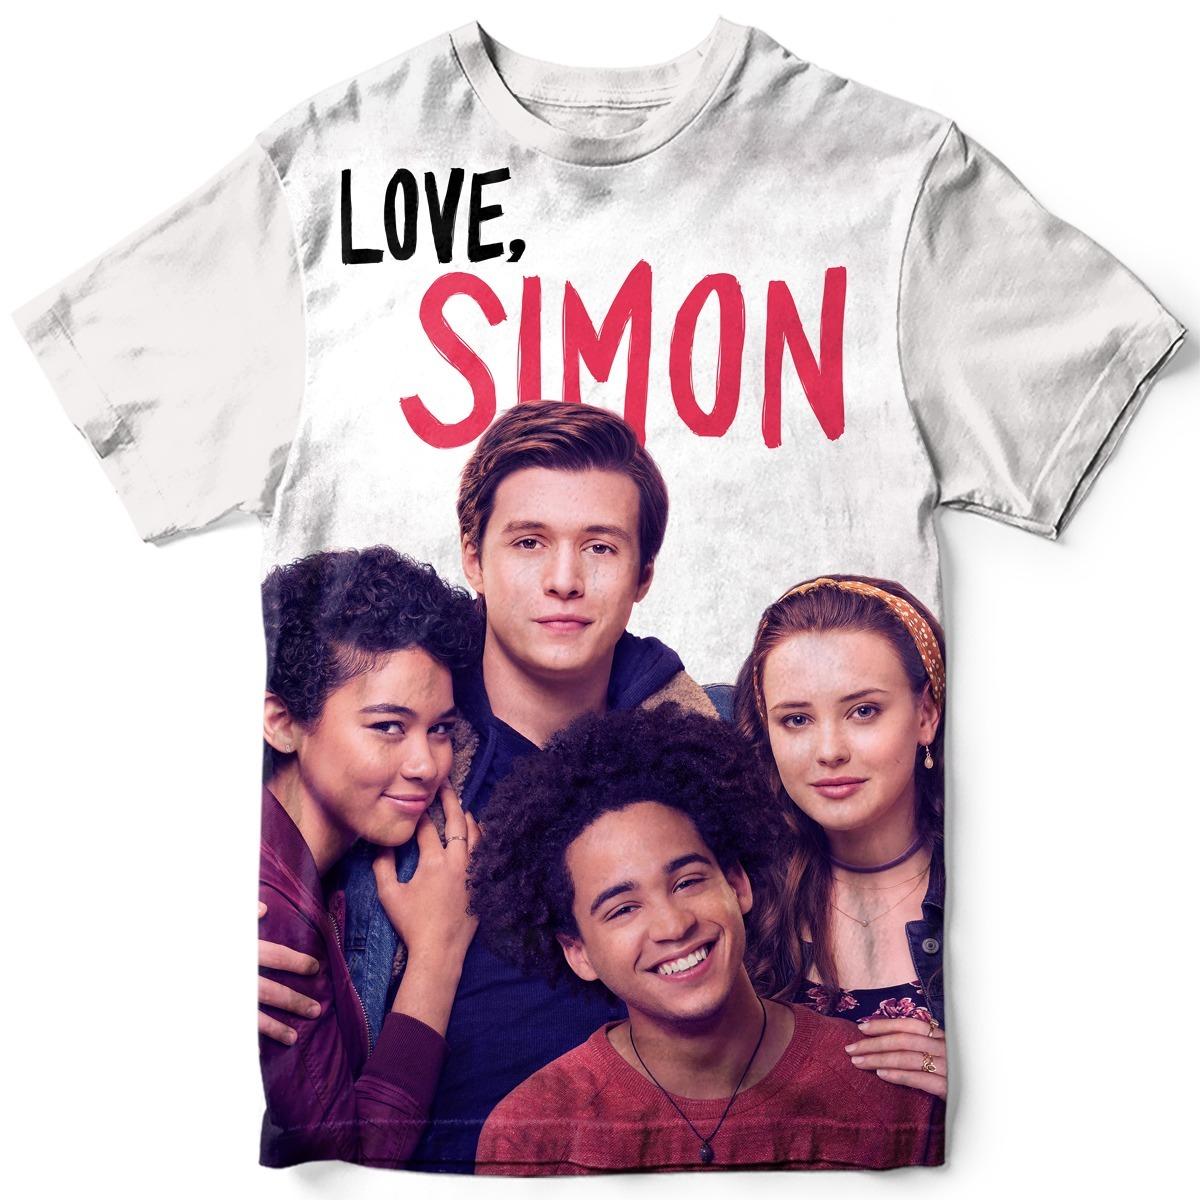 Kit 2 Camisetas Love Simon Livro Filme Lgbt Comédia Romance - R  179 ... 45ba08eaf4785